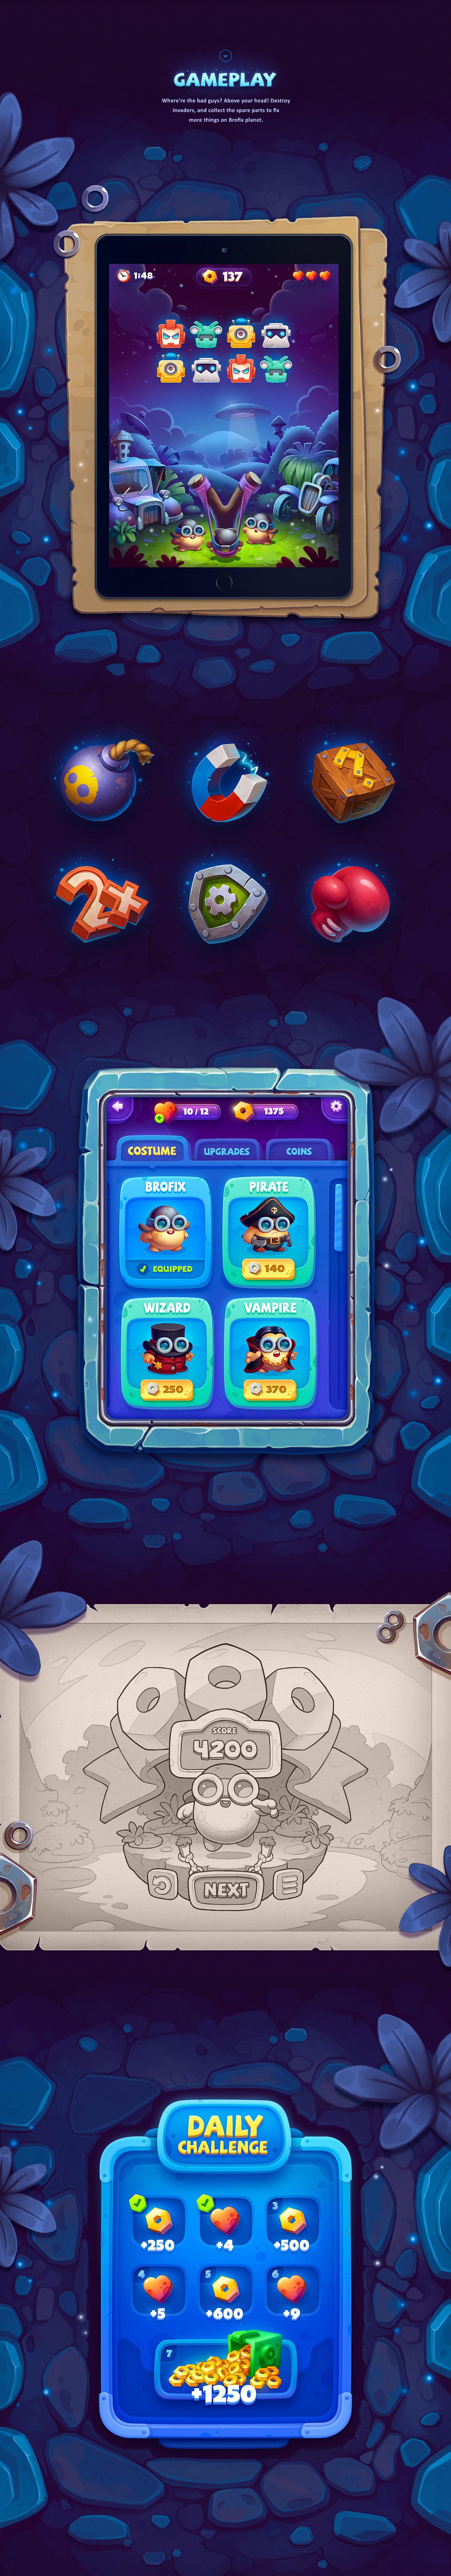 game Character sketch Icon environment mecha robot UI cute arcade